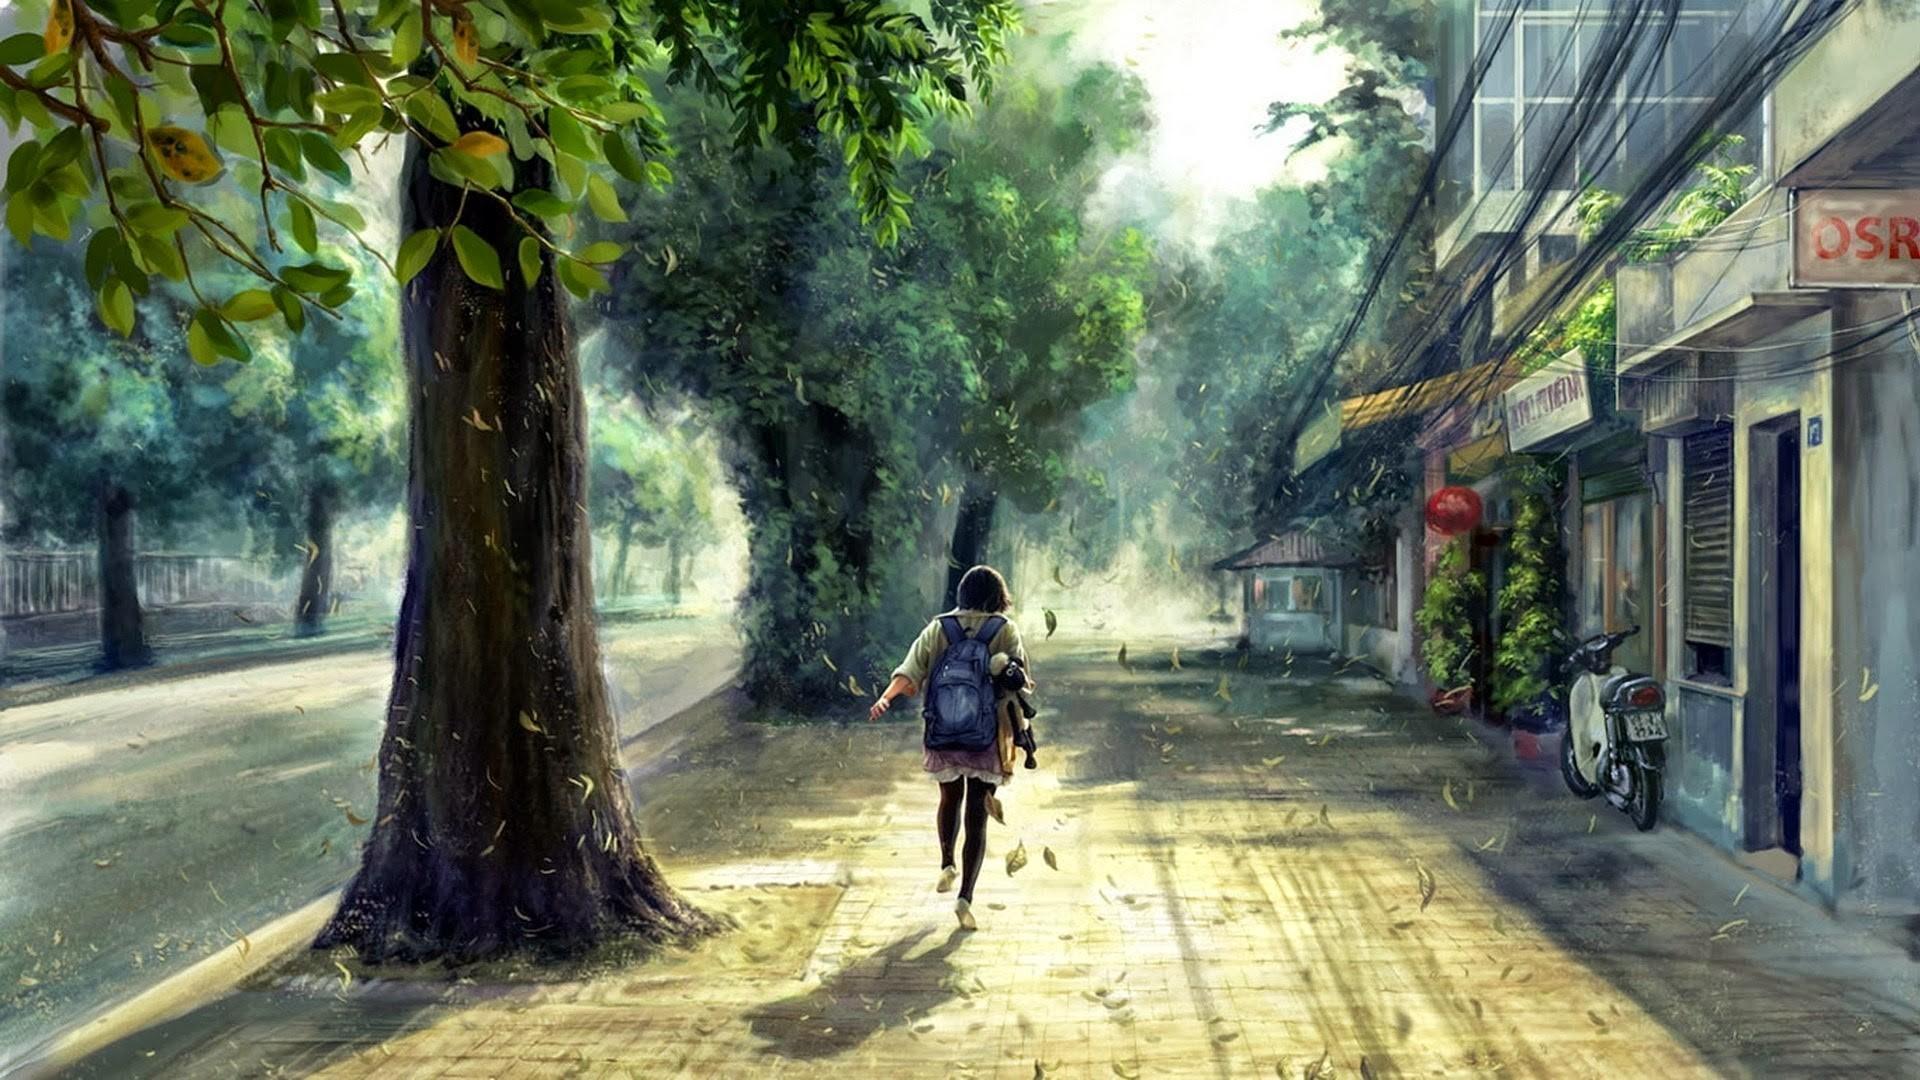 Dark Anime Scenery Wallpaper Download Free Stunning High